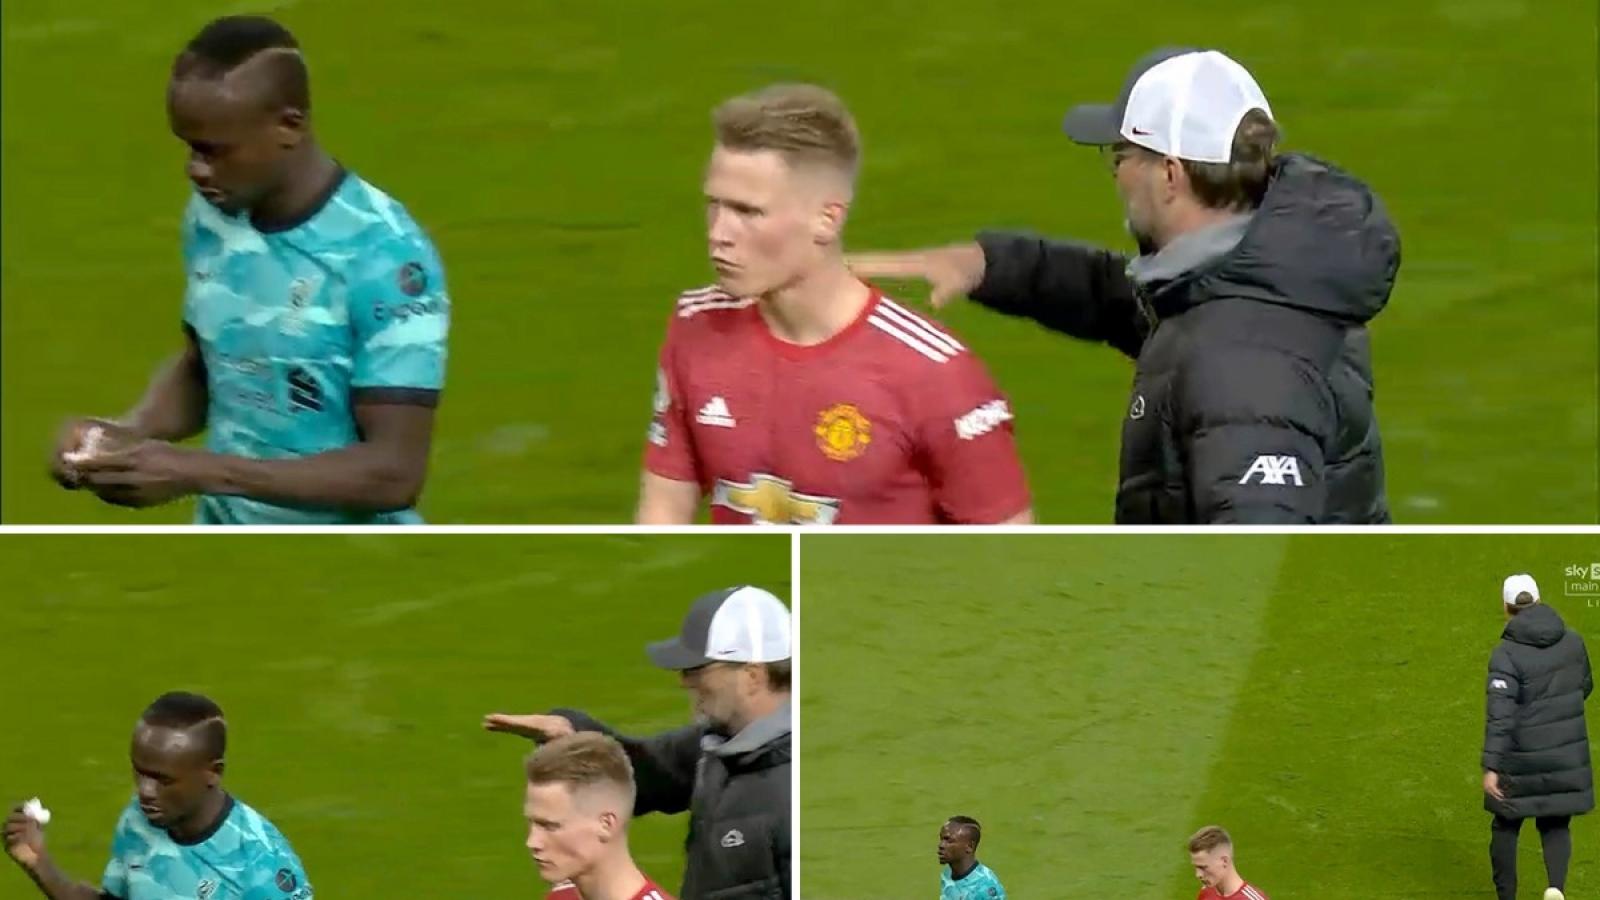 Dấu hiệu cho thấy Sadio Mane sắp chia tay Liverpool?